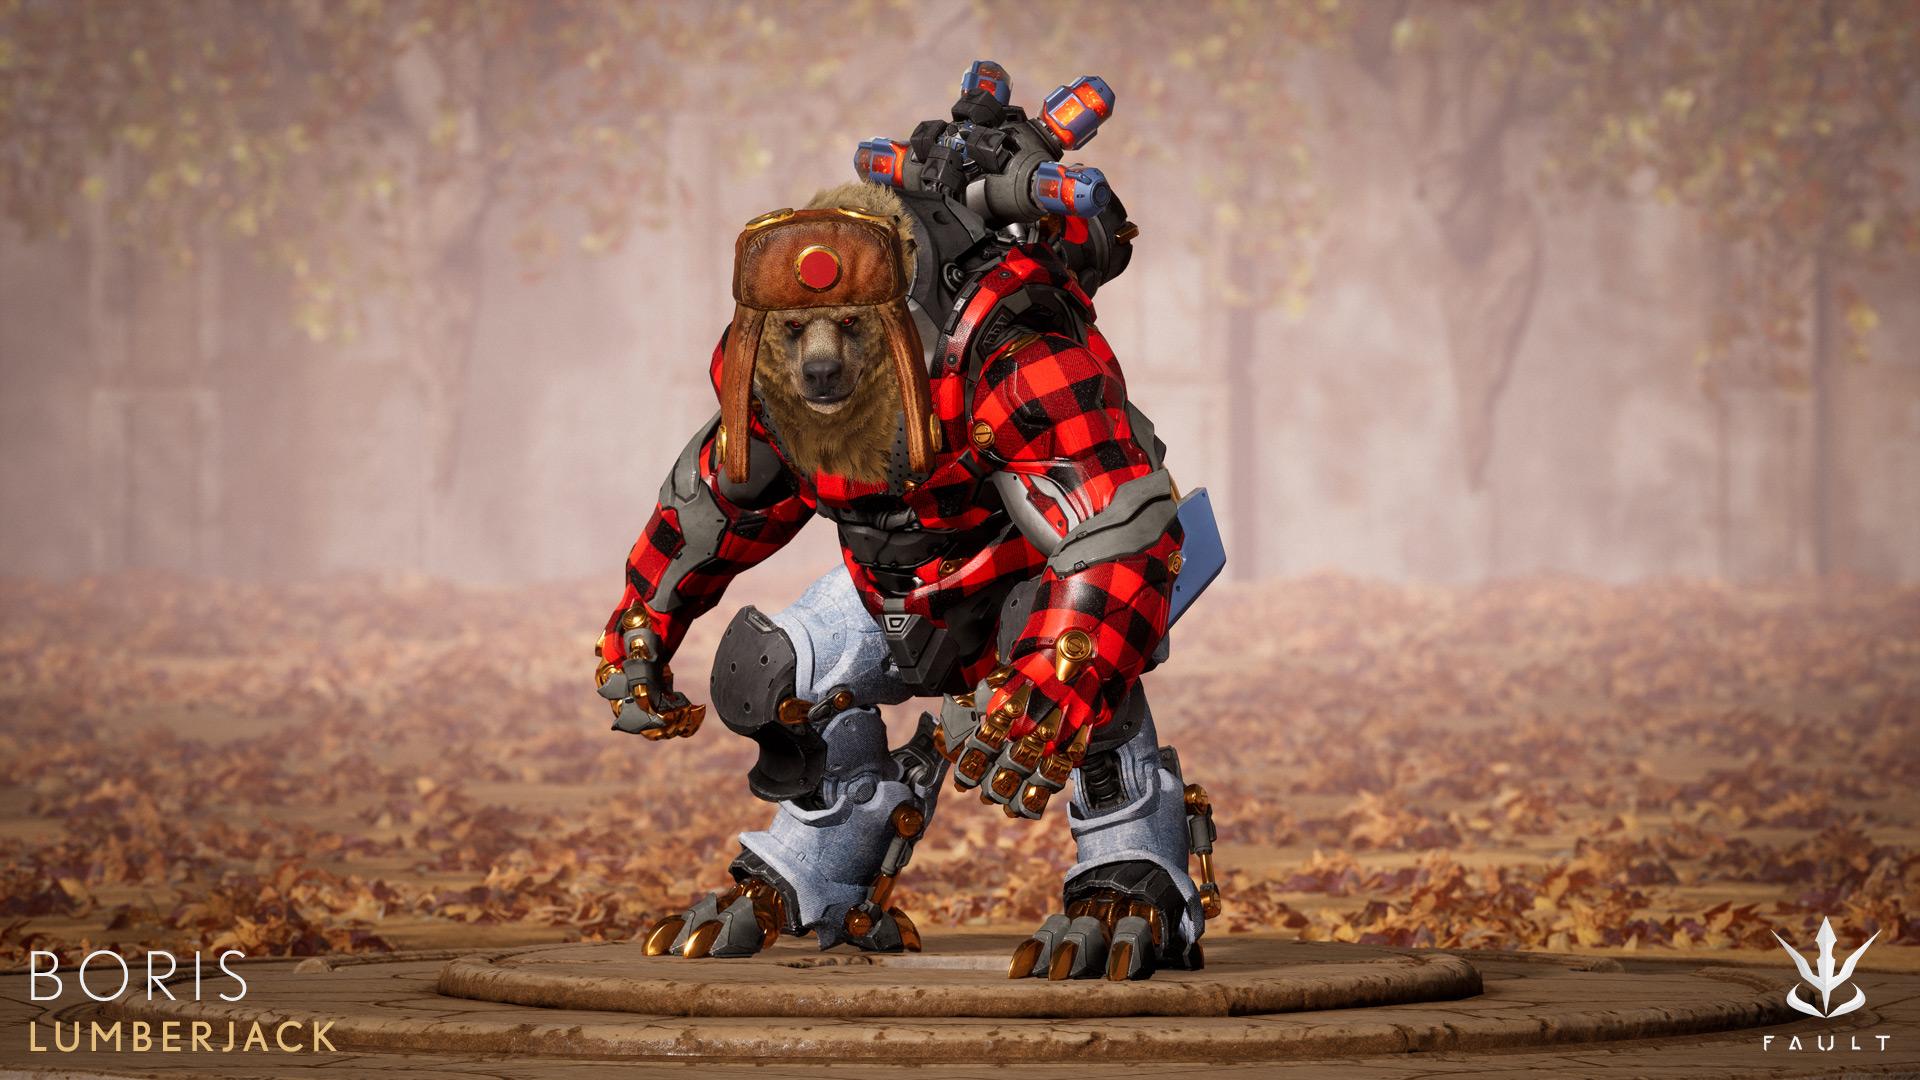 Boris Lumberjack Fault Paragon Skin